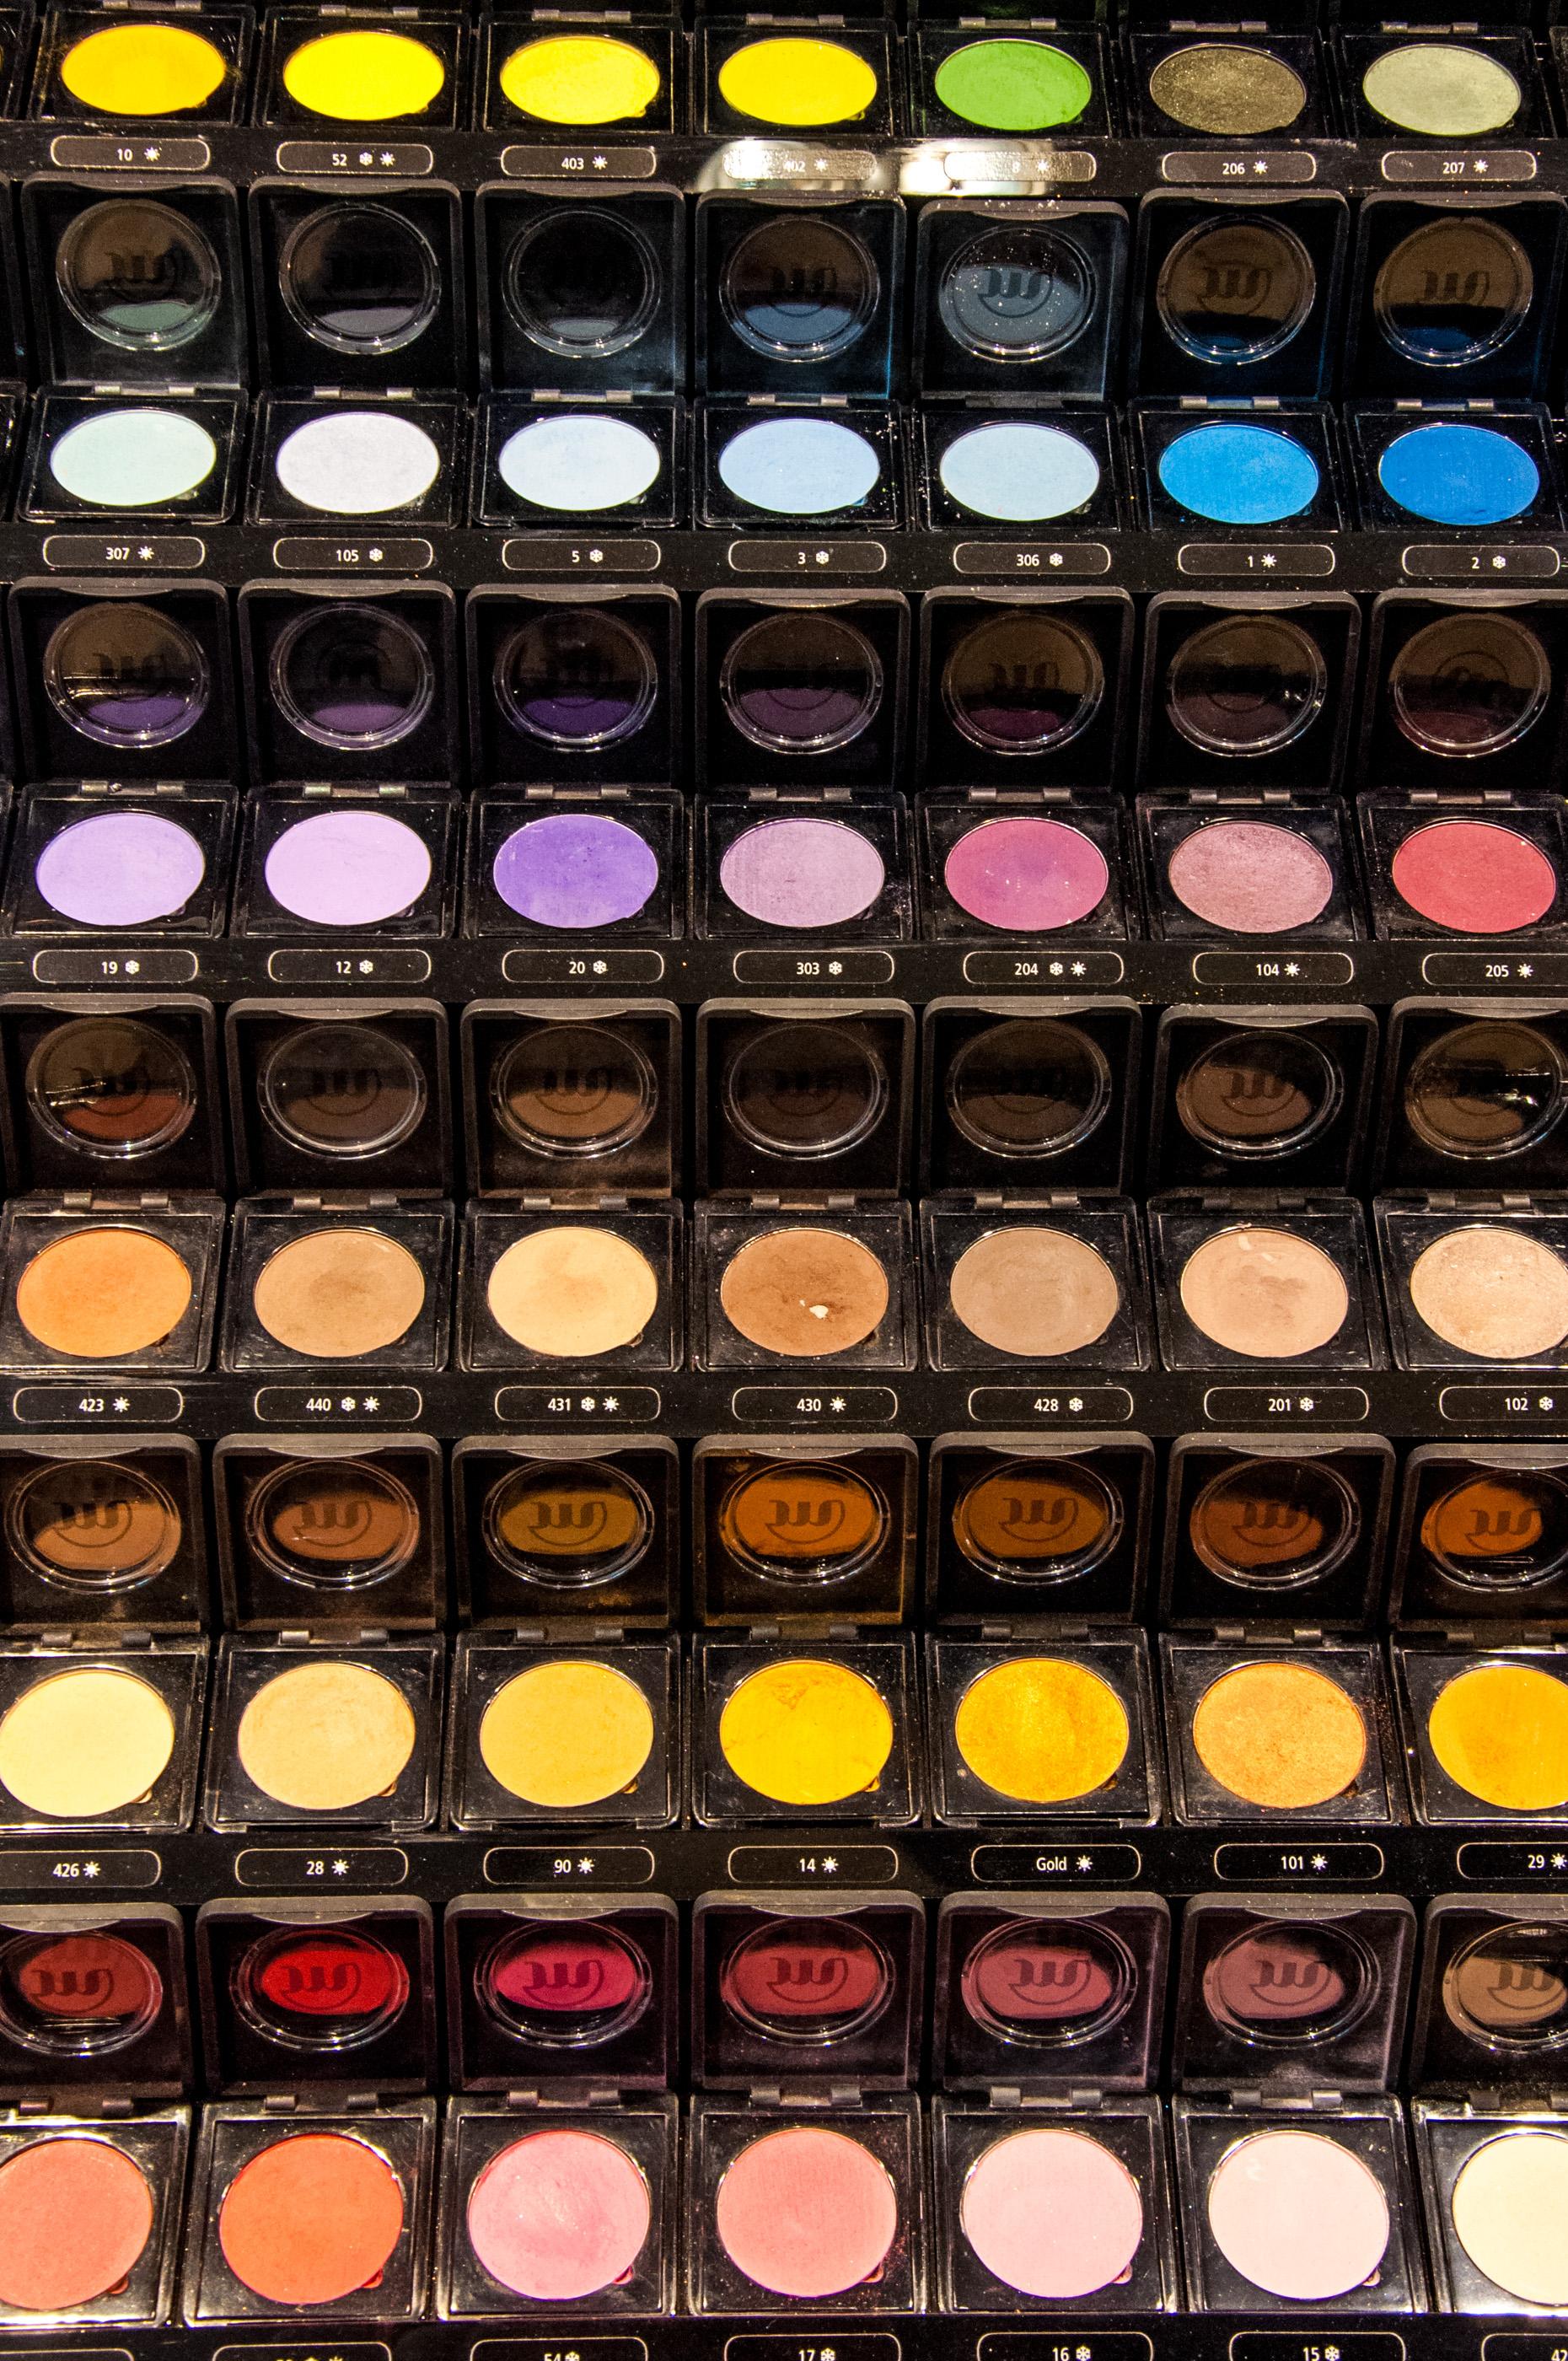 Eye make up cosmetics  display photo